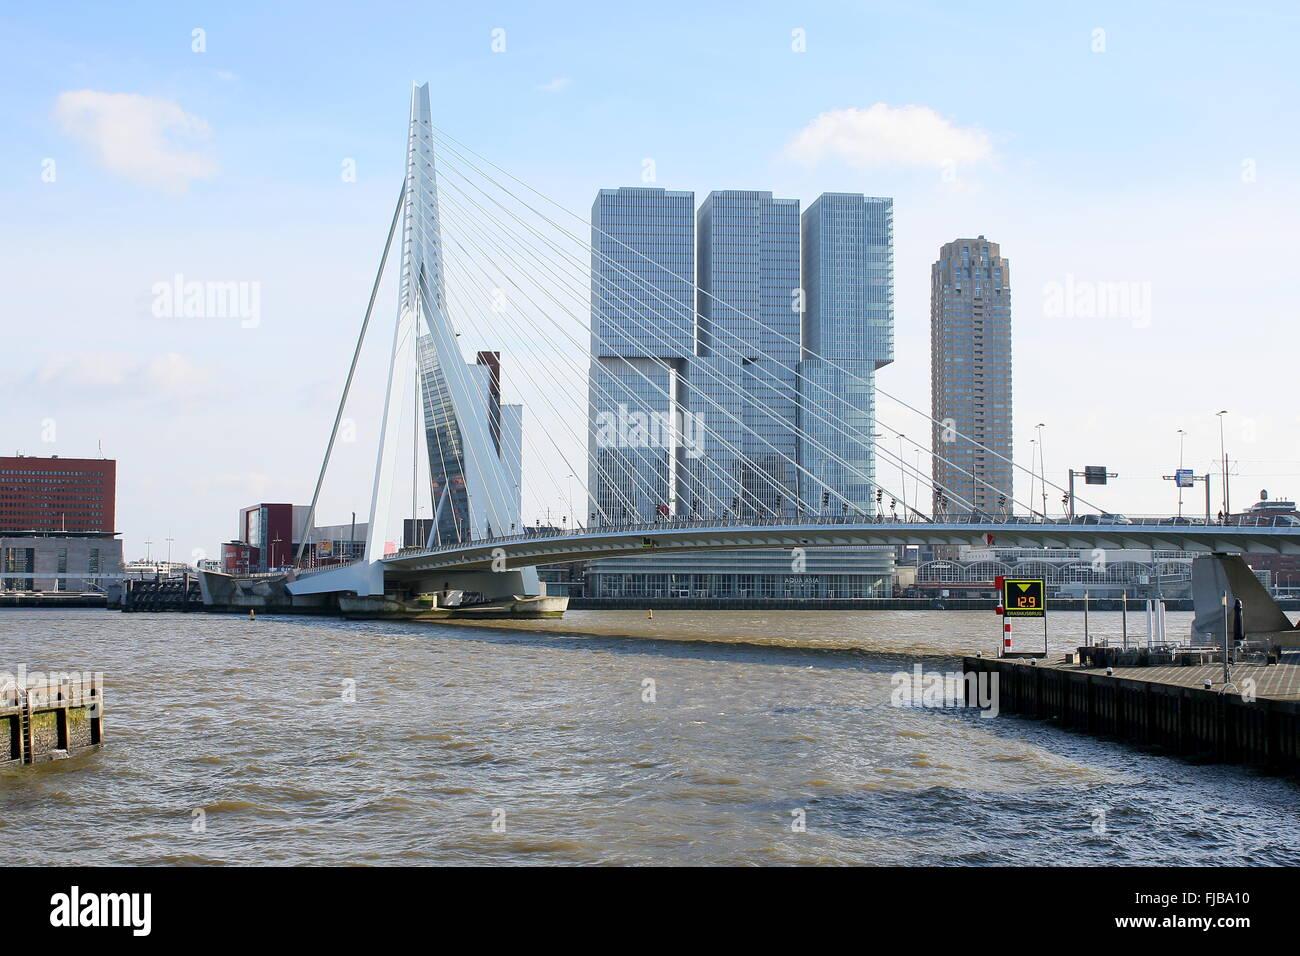 Nieuwe Maas river  with Erasmus bridge, Rotterdam, Netherlands, Behind 'De Rotterdam' skyscraper complex - Stock Image